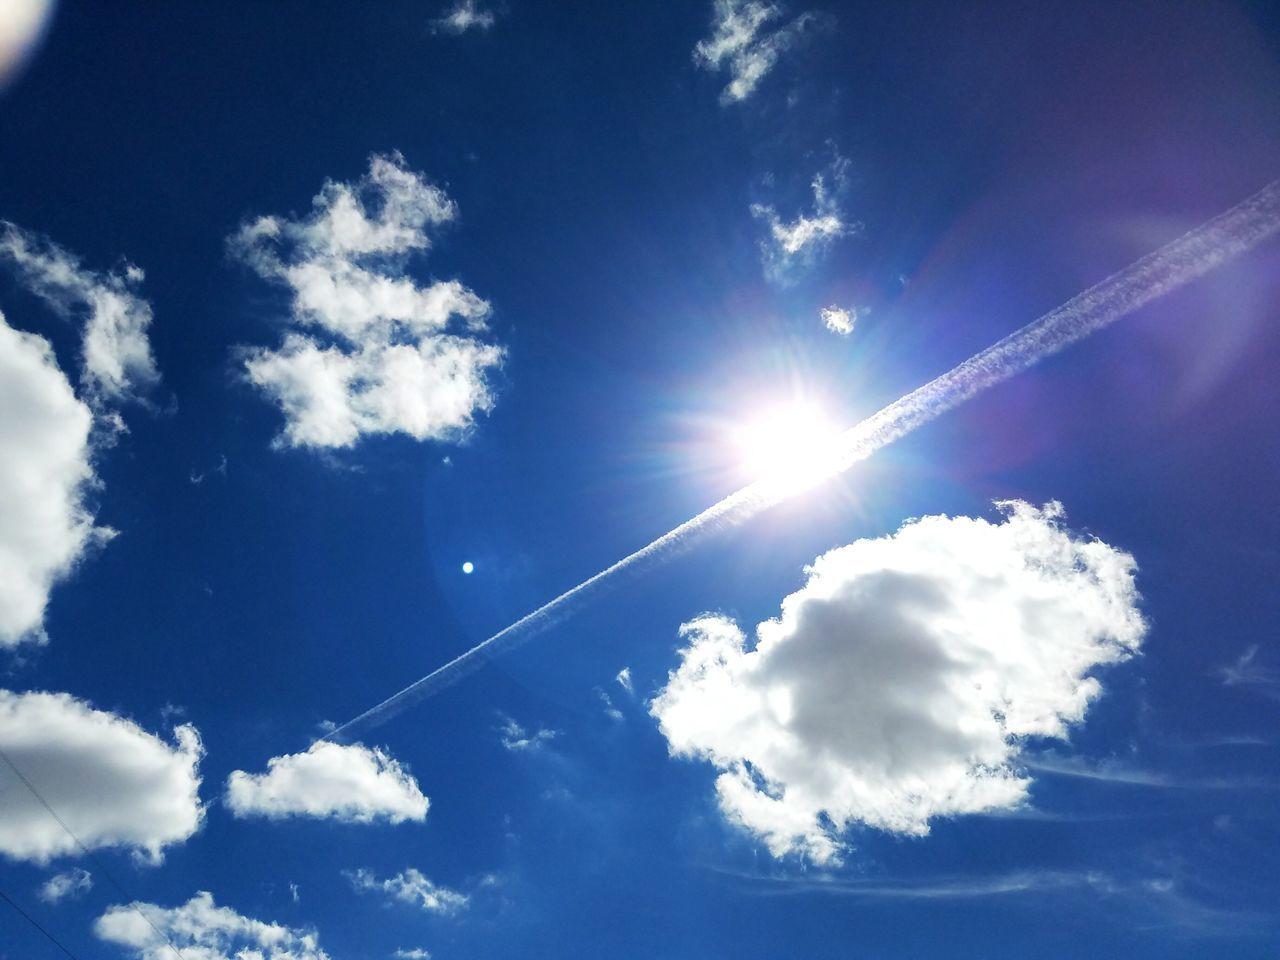 Blue Sky Blue Skyblue Sky Sky_collection Sky And Clouds Sky_collection Skyscape Cloud Clouds And Sky Clouds Collection Jet Trails Sun Sunny Bright Bright Sky Clouds In The Sky Sunny Skies White Clouds And Blue Sky Clouds